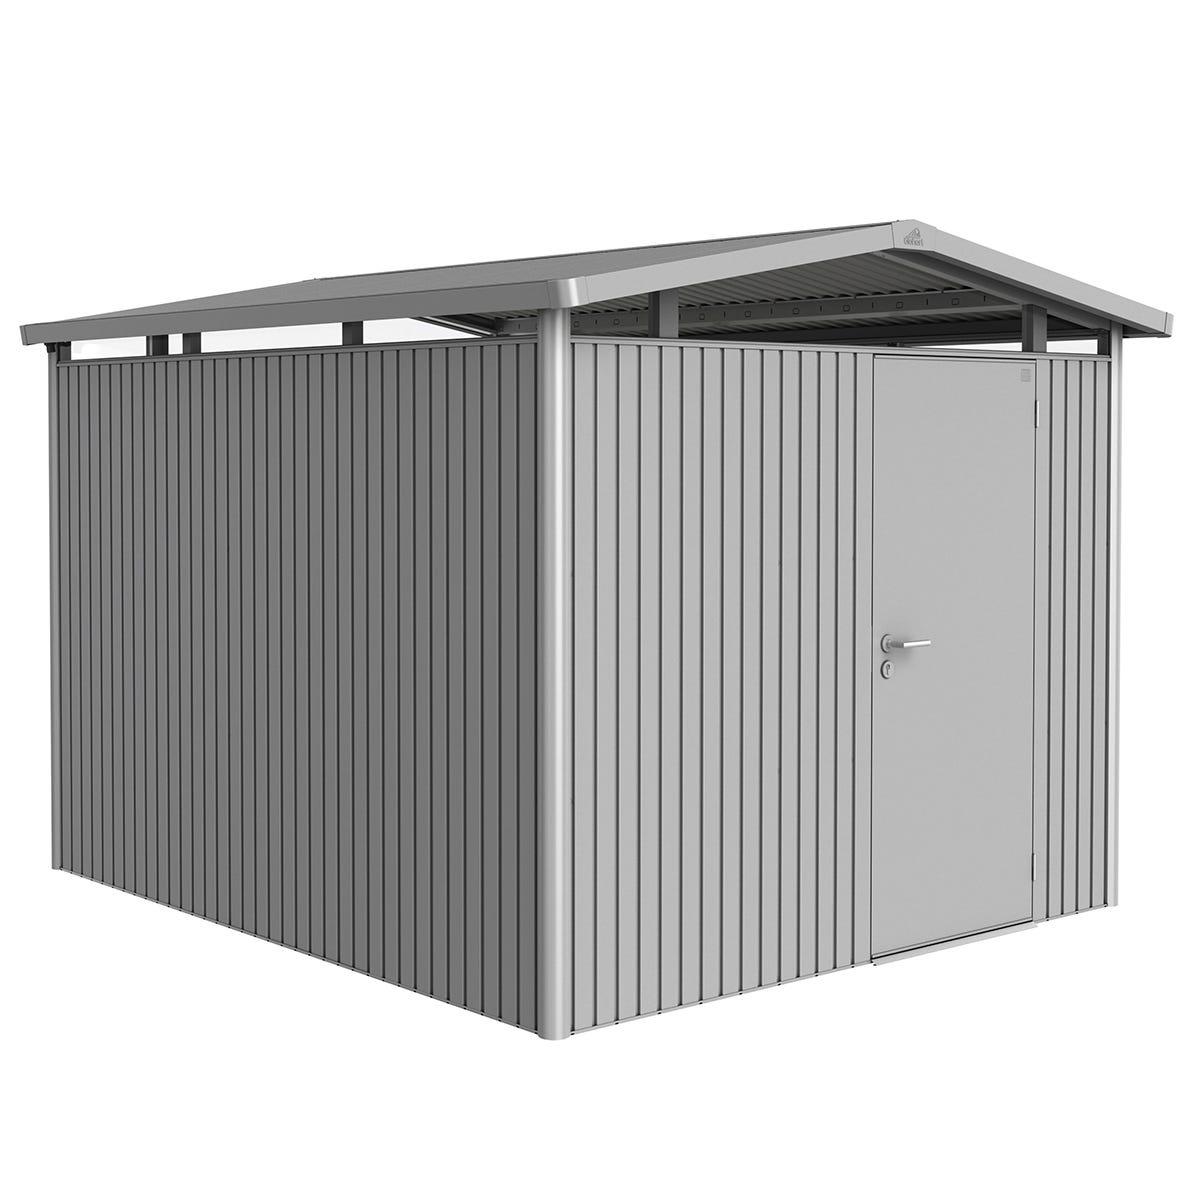 Biohort Panorama Metal Shed P5 Standard door 9' x 10' - Metallic Silver